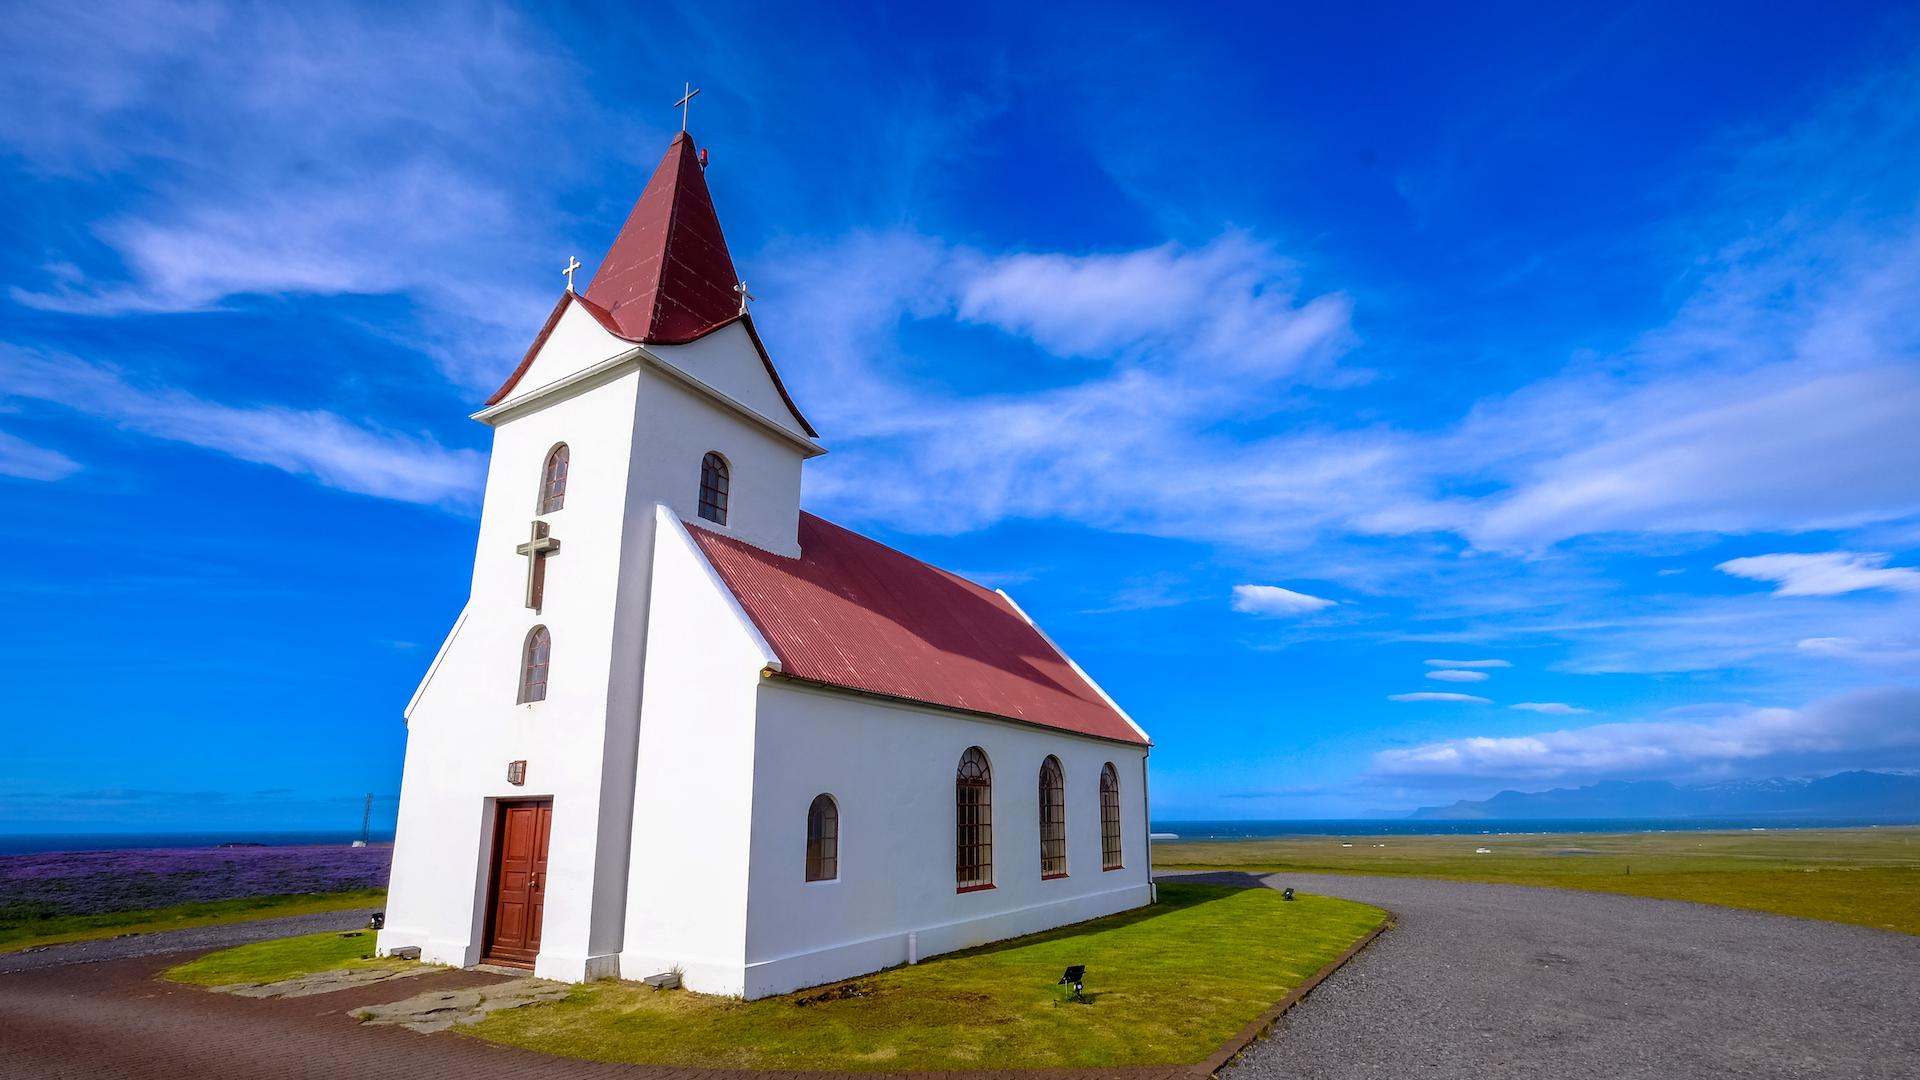 We Believe: The Church Hero Image